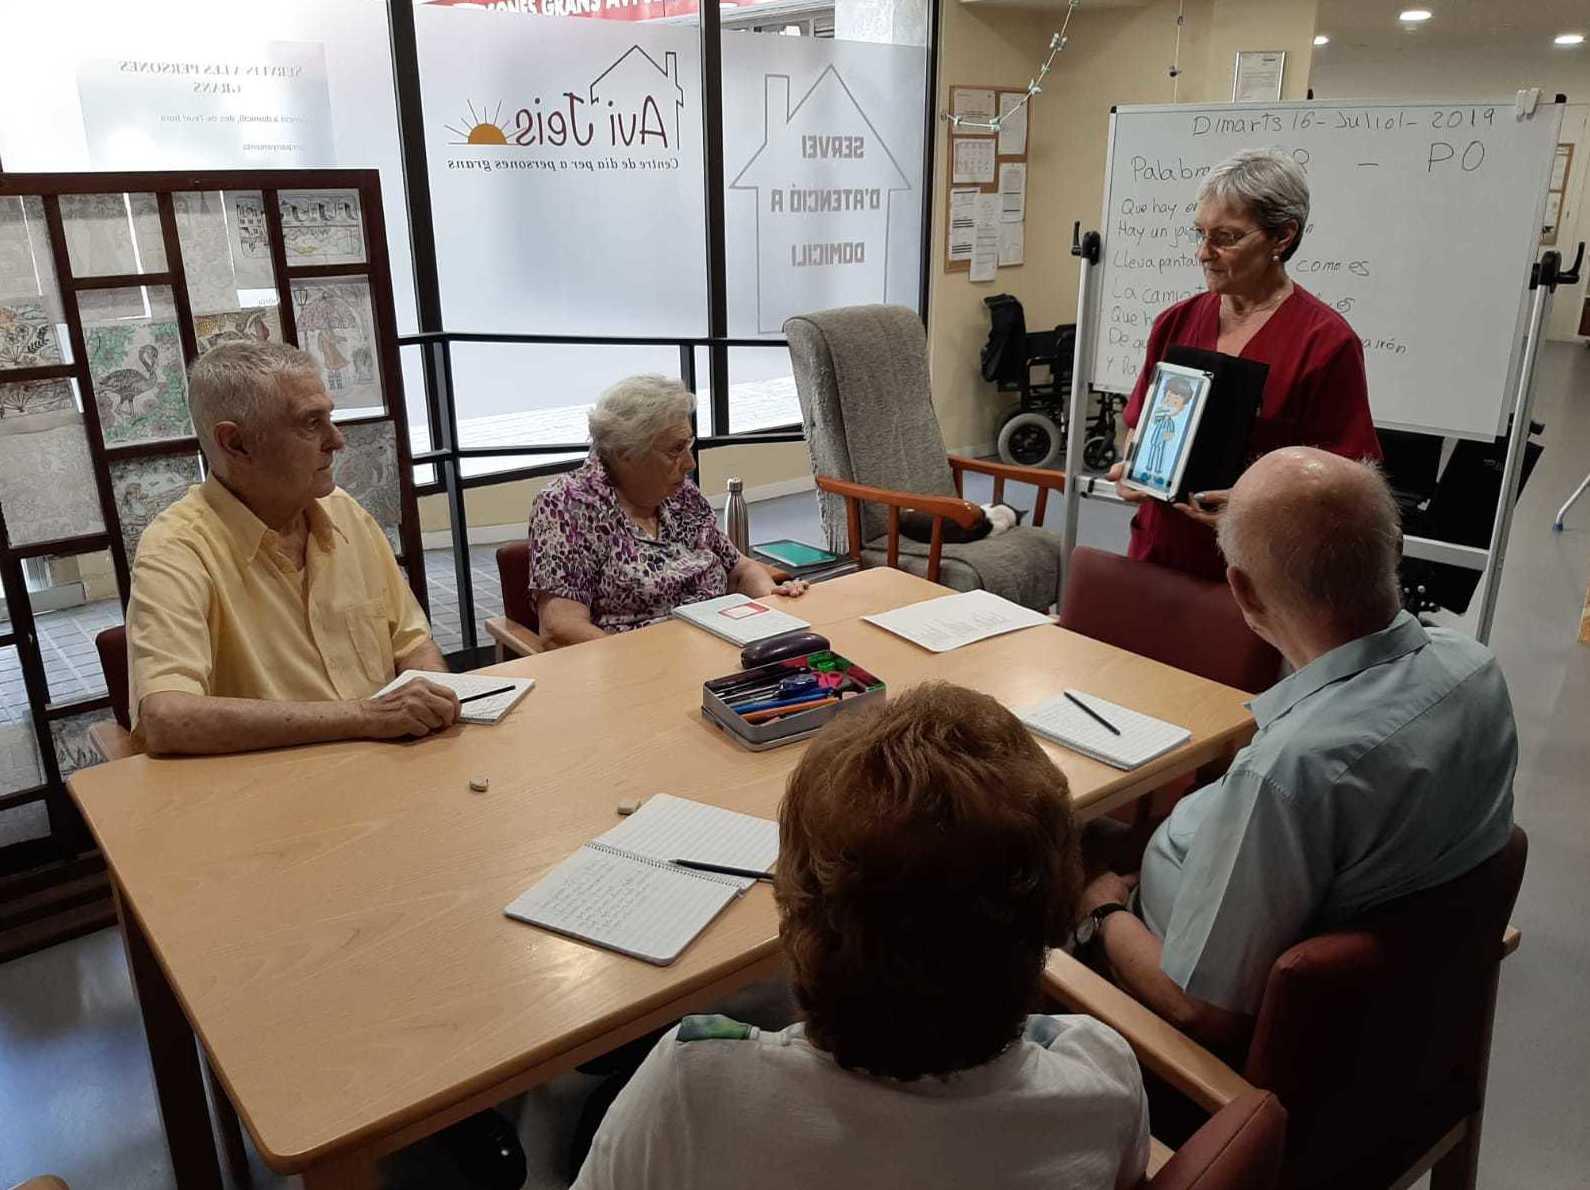 Estimulación cognitiva: Servicios de Avi Jeis Centro de dia para personas mayores